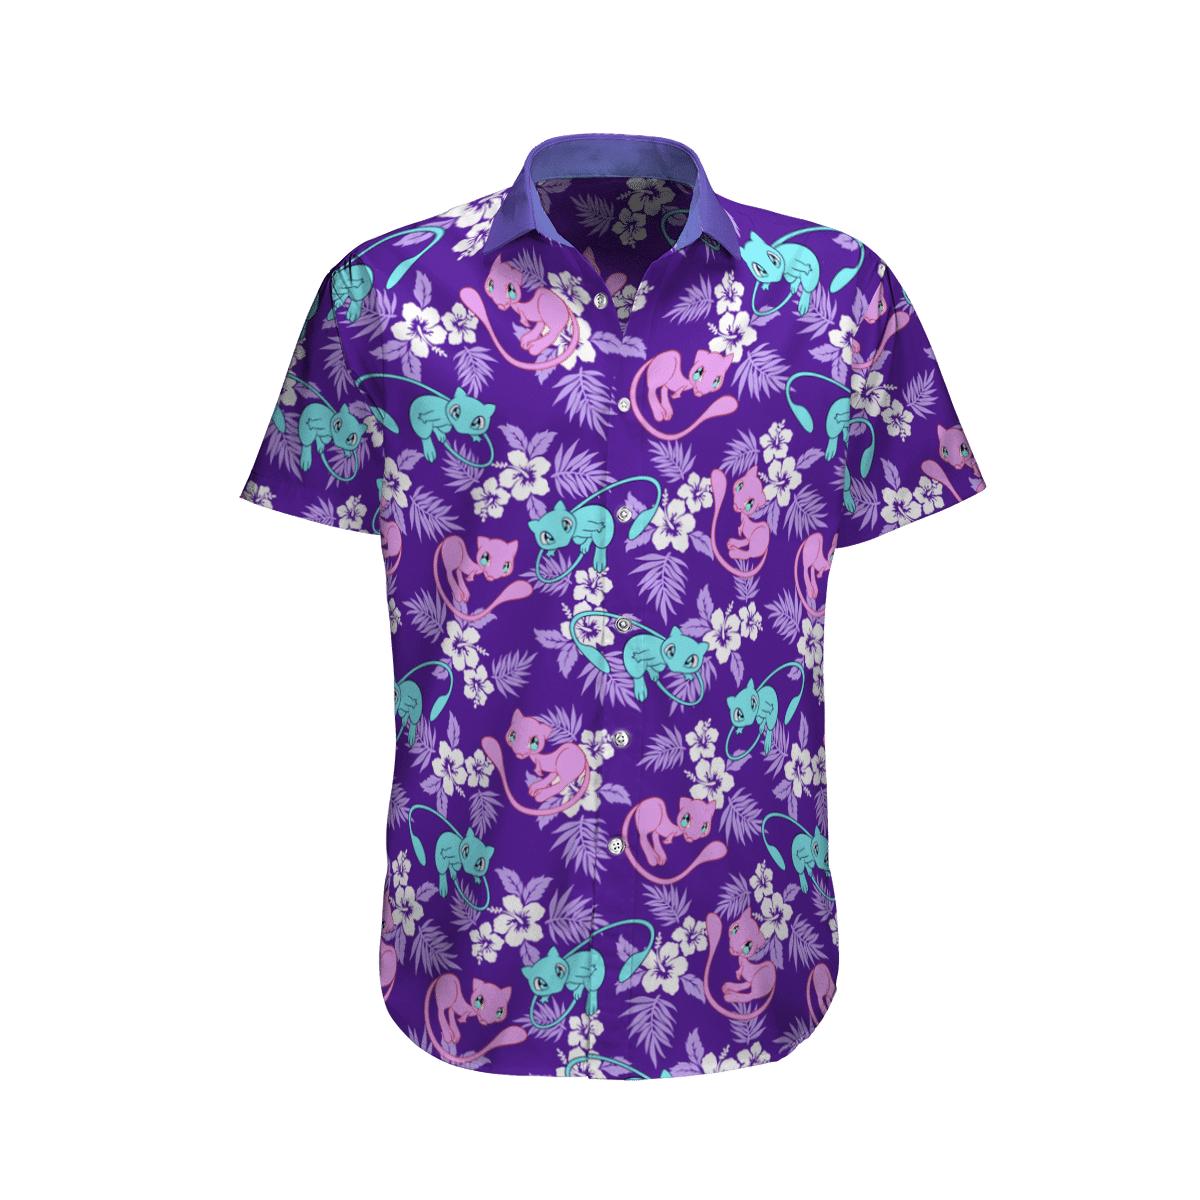 Pokemon Mew Mewtwo Tropical Beach Hawaiian Shirt And Shorts